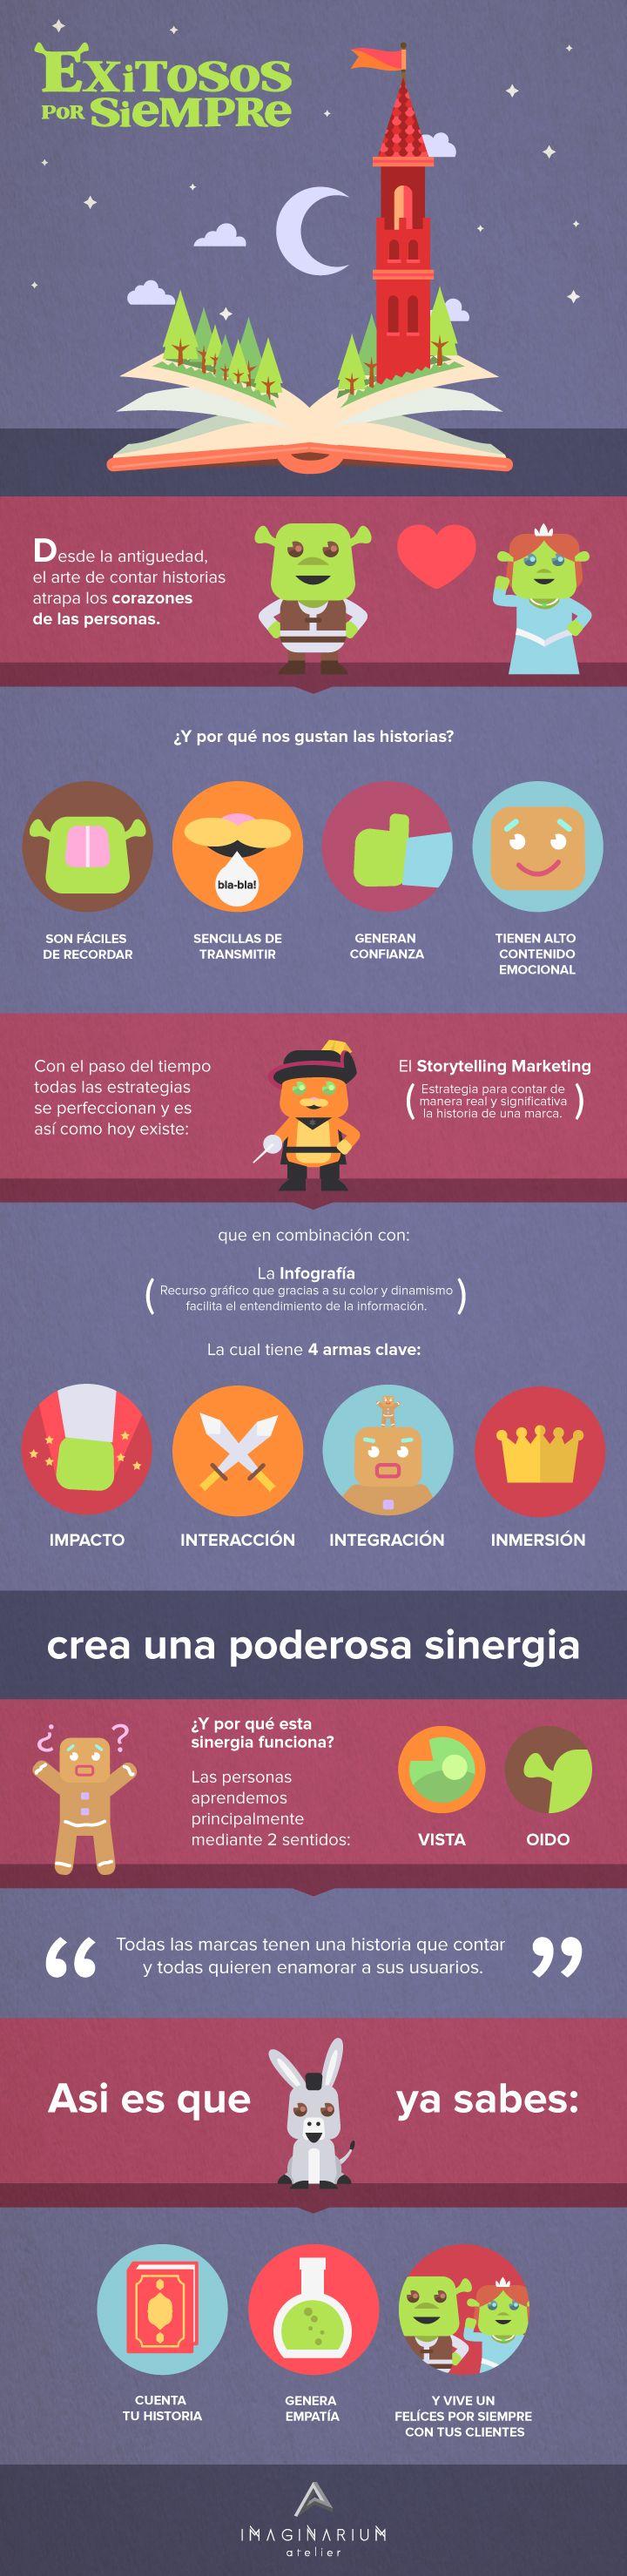 Infografía-exitosos-por-siempre-1